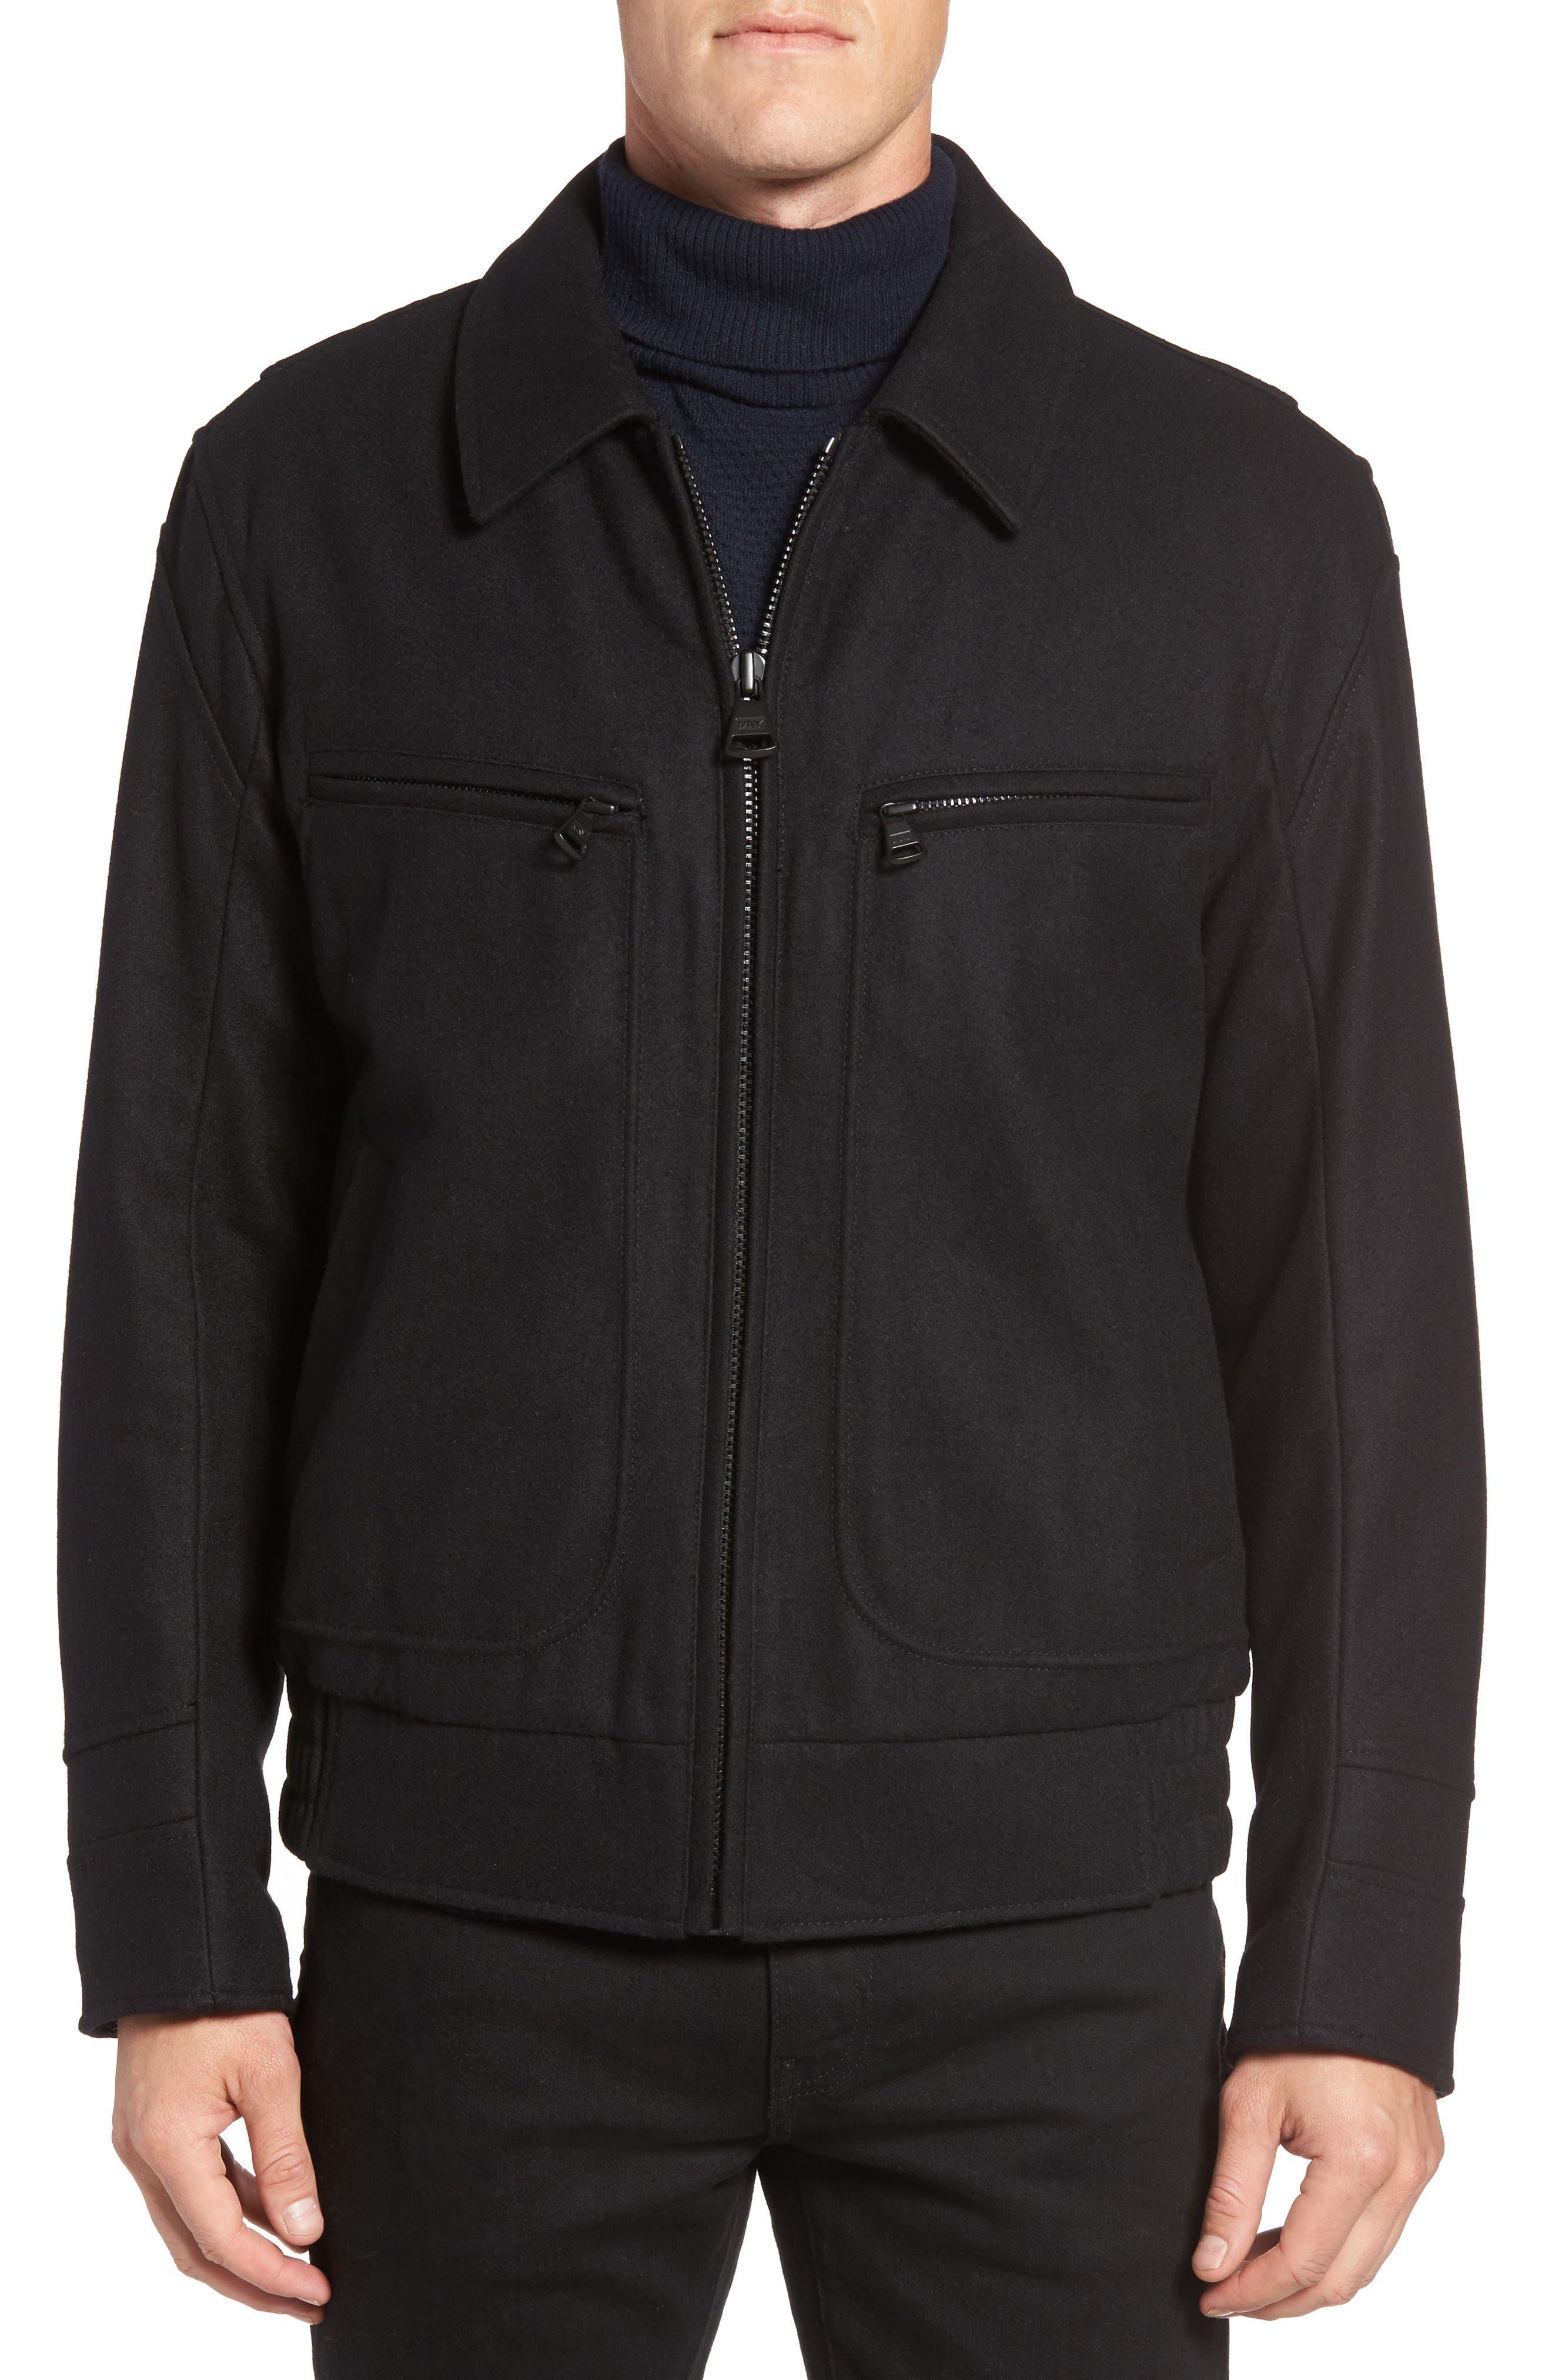 Concord Faux Shearling Aviator Jacket,                             Alternate thumbnail 4, color,                             Black